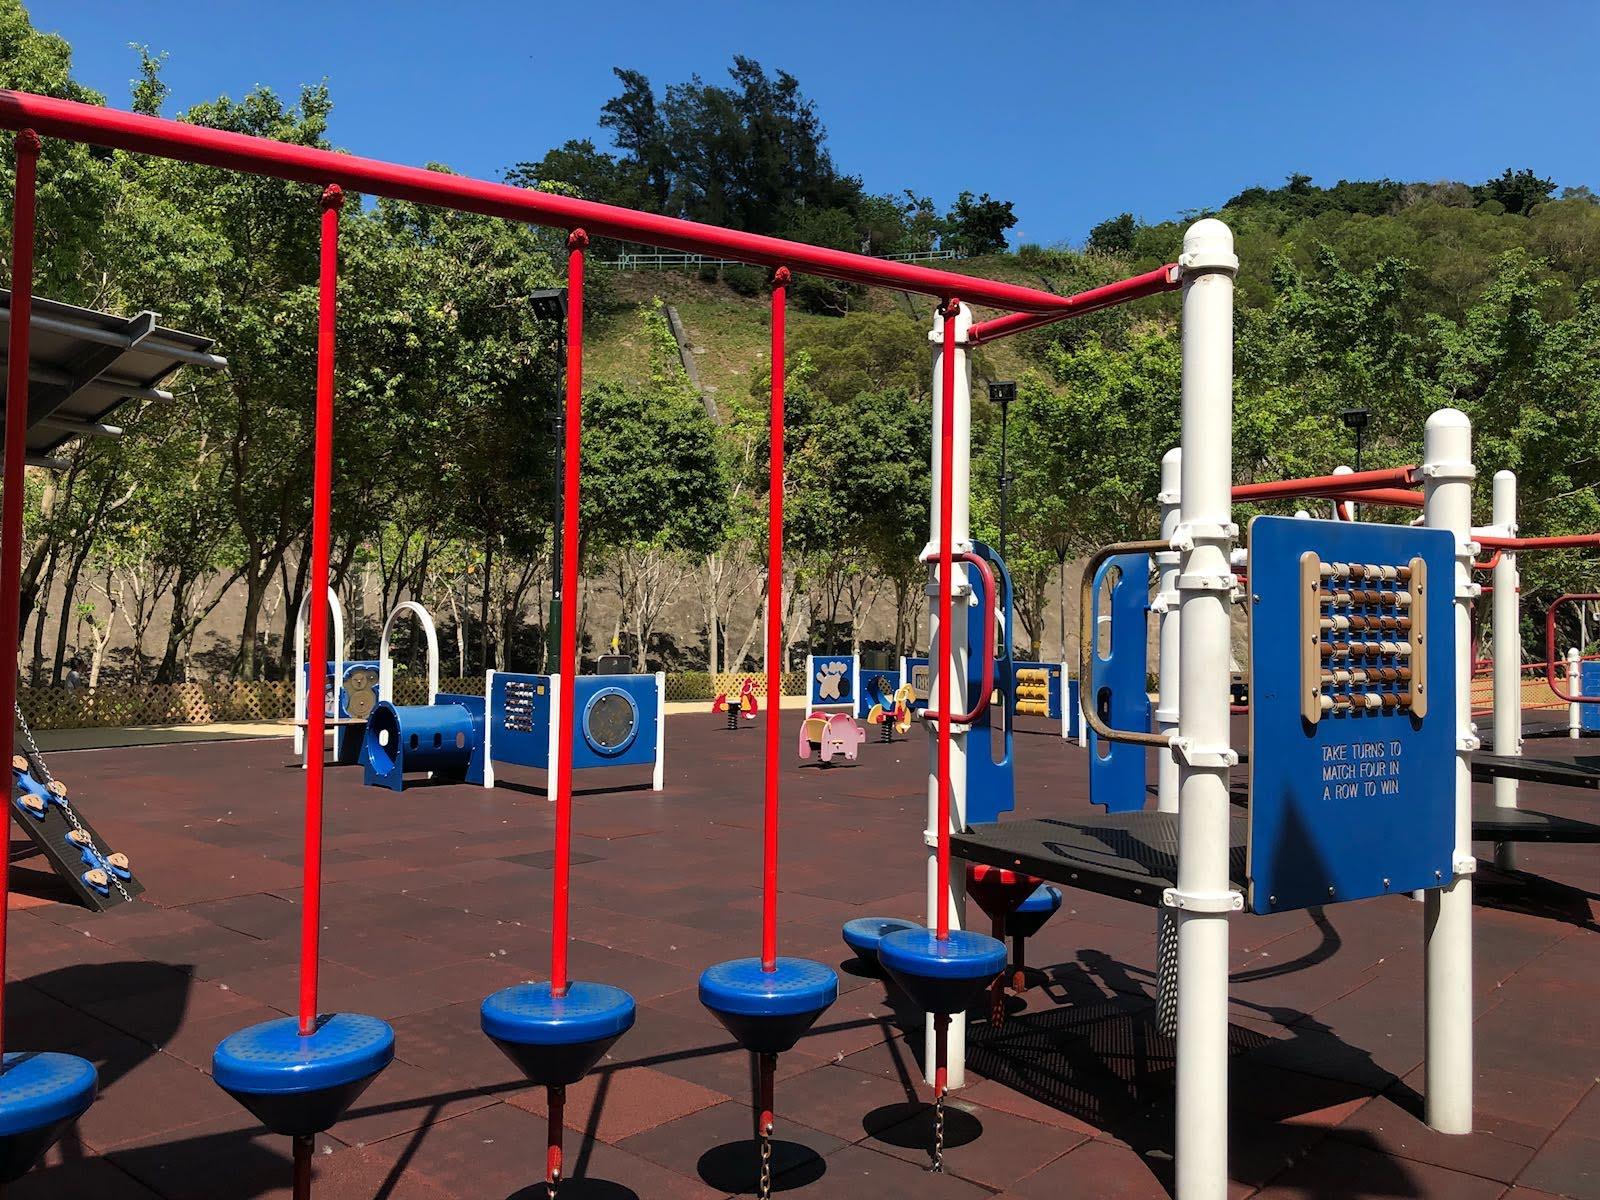 Siu Sai Wan Promenade's balance equipment at playground